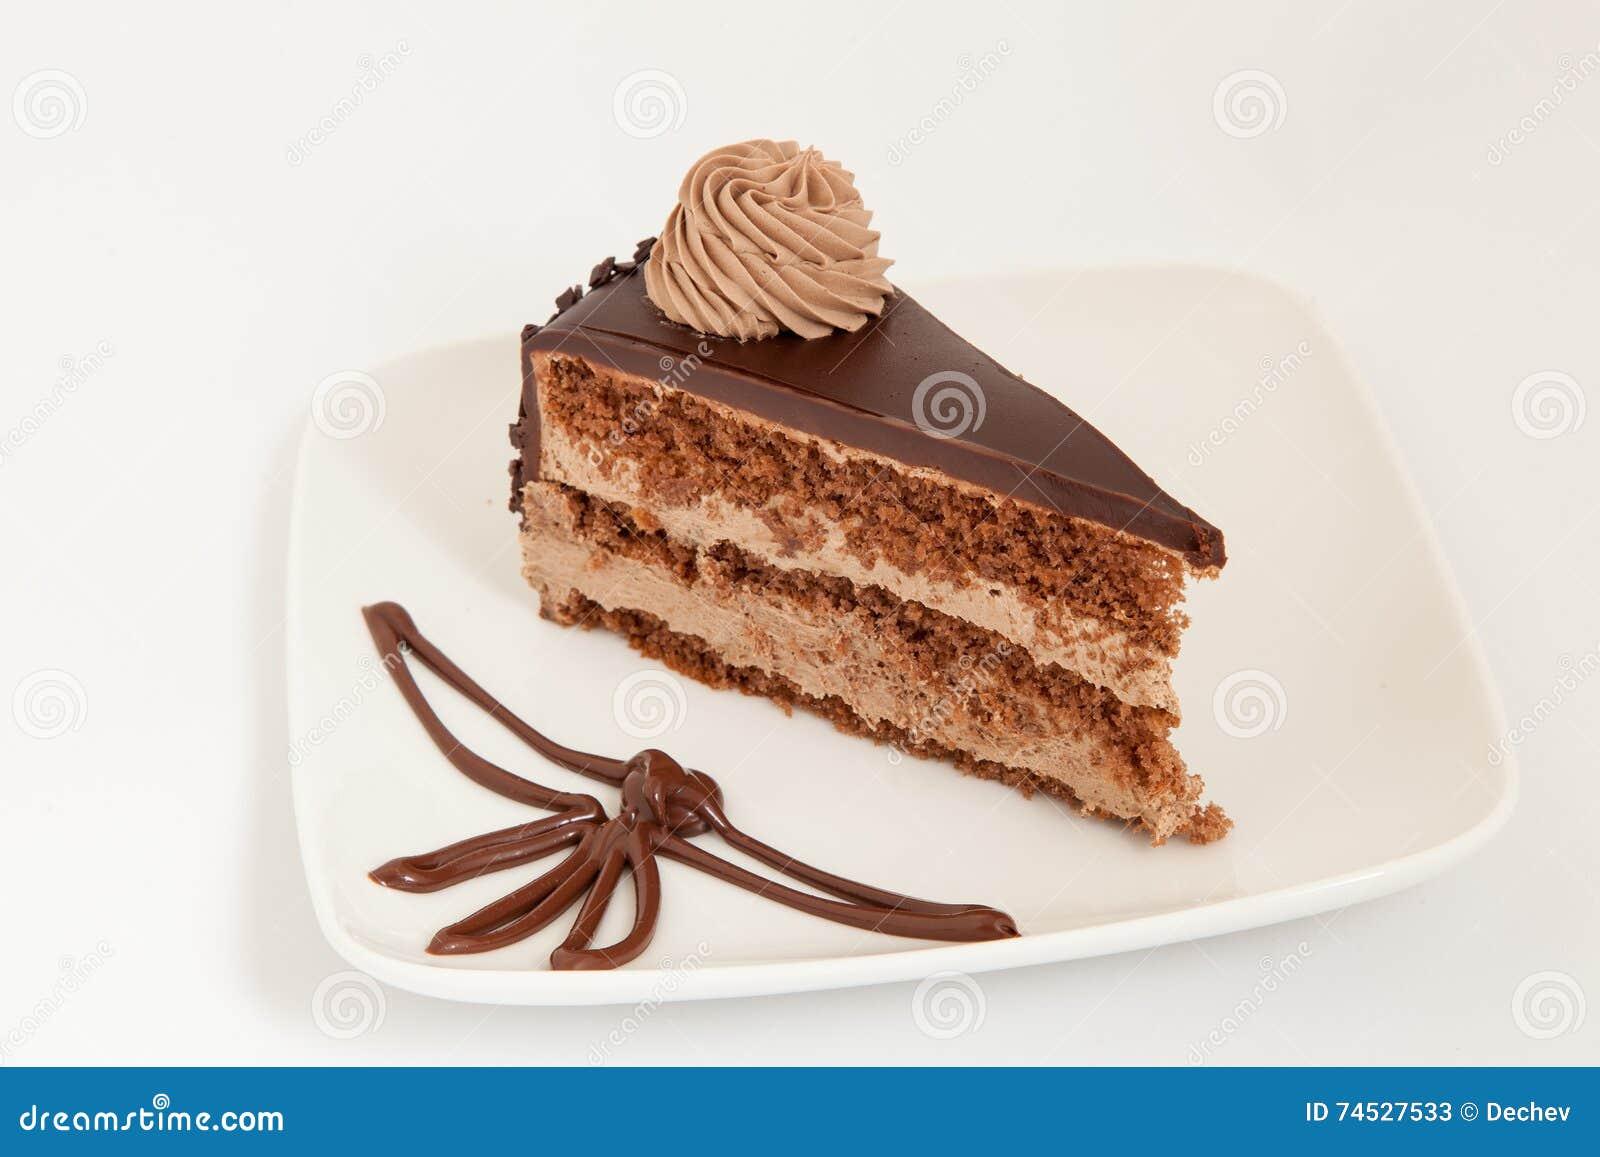 Chocolate Mousse Cake Decoration